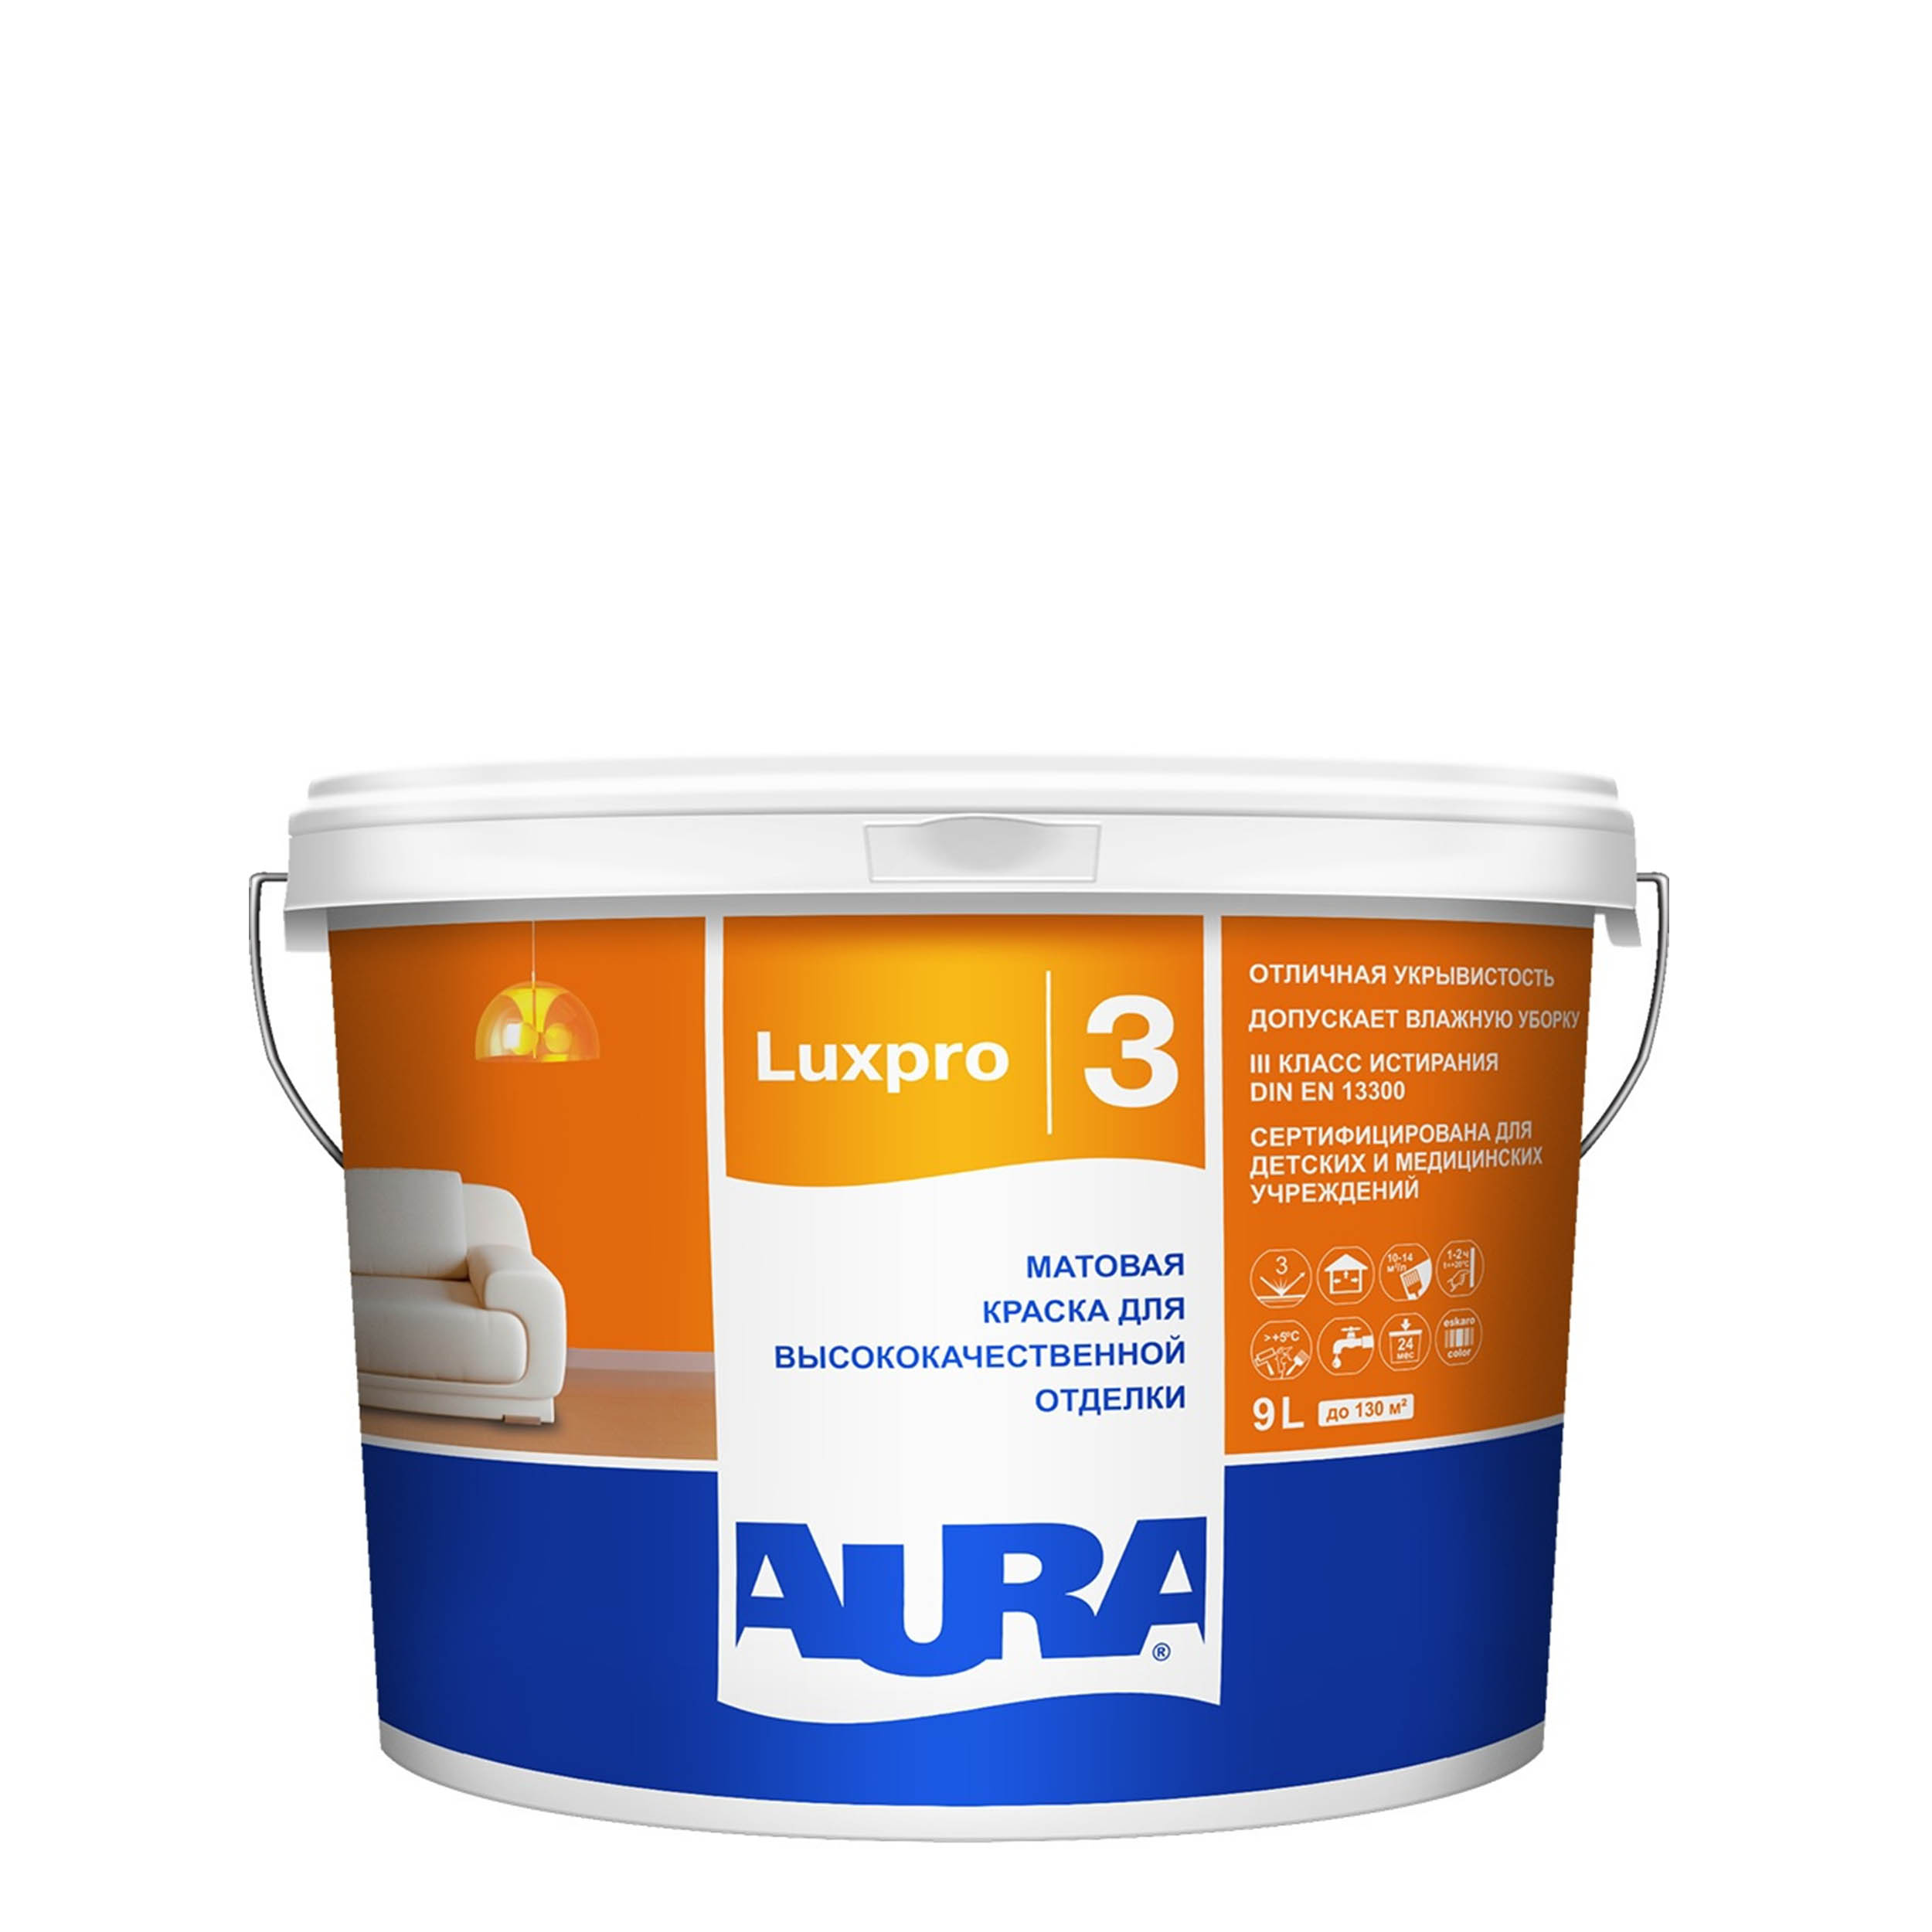 Фото 3 - Краска интерьерная, Aura LuxPRO 3, RAL 6001, 11 кг.